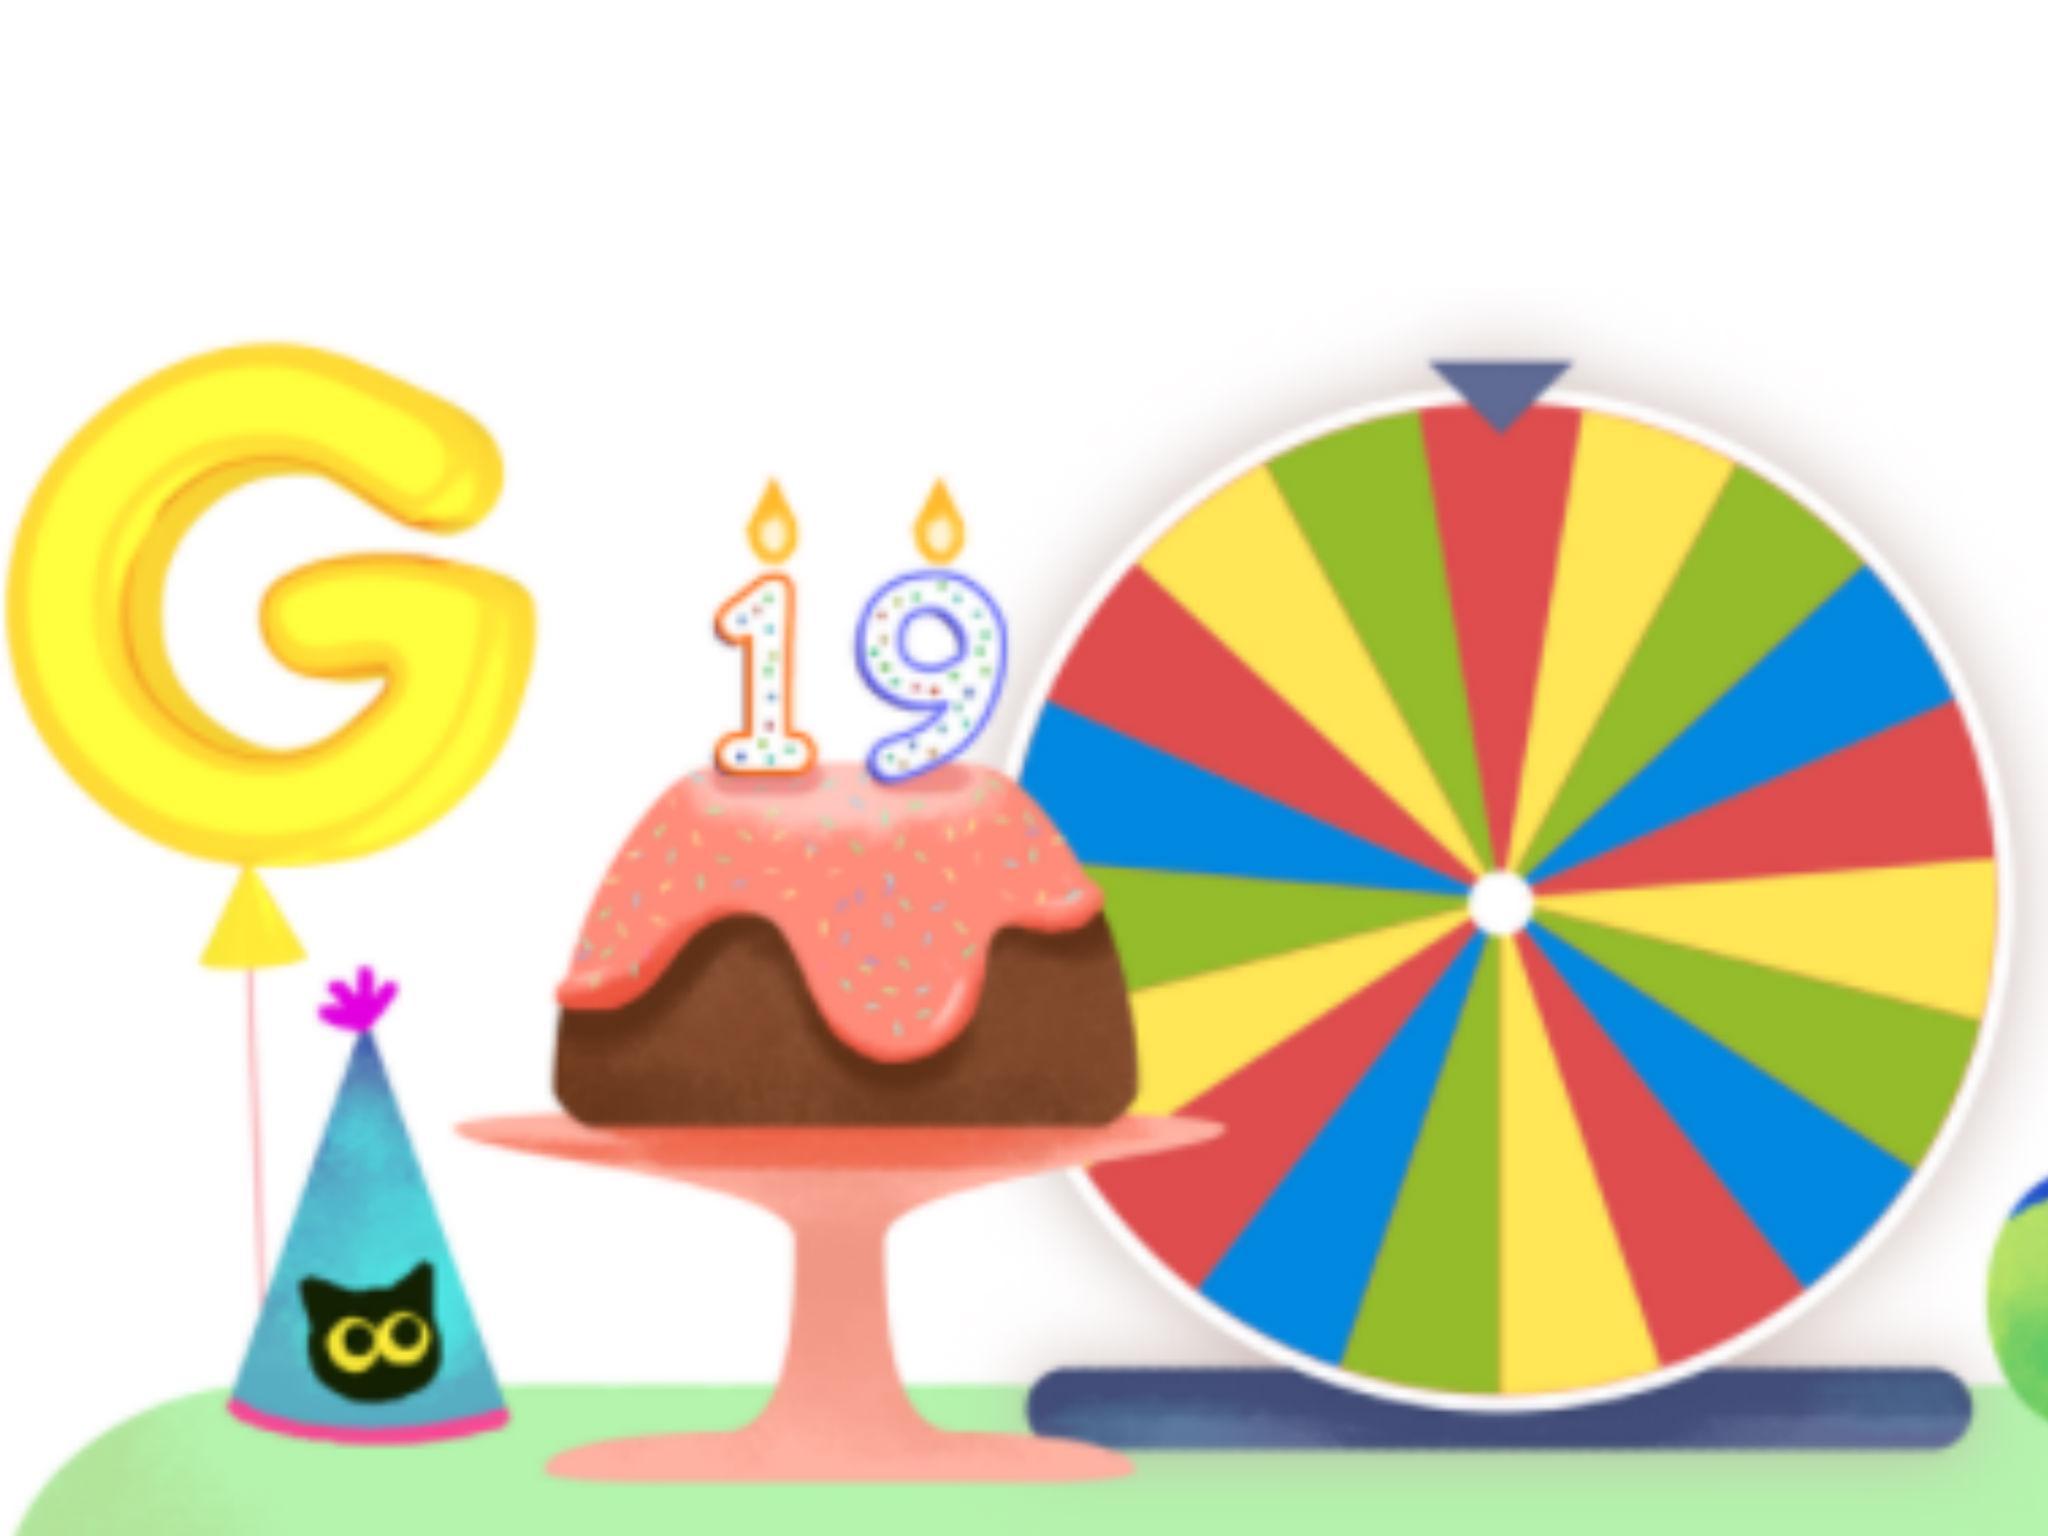 Earth Day Quiz,Tic-Tac-Toe,Snake,Google Birthday Surprise Spiner,Google Chrome,Google Games,Google Doodles,Google,